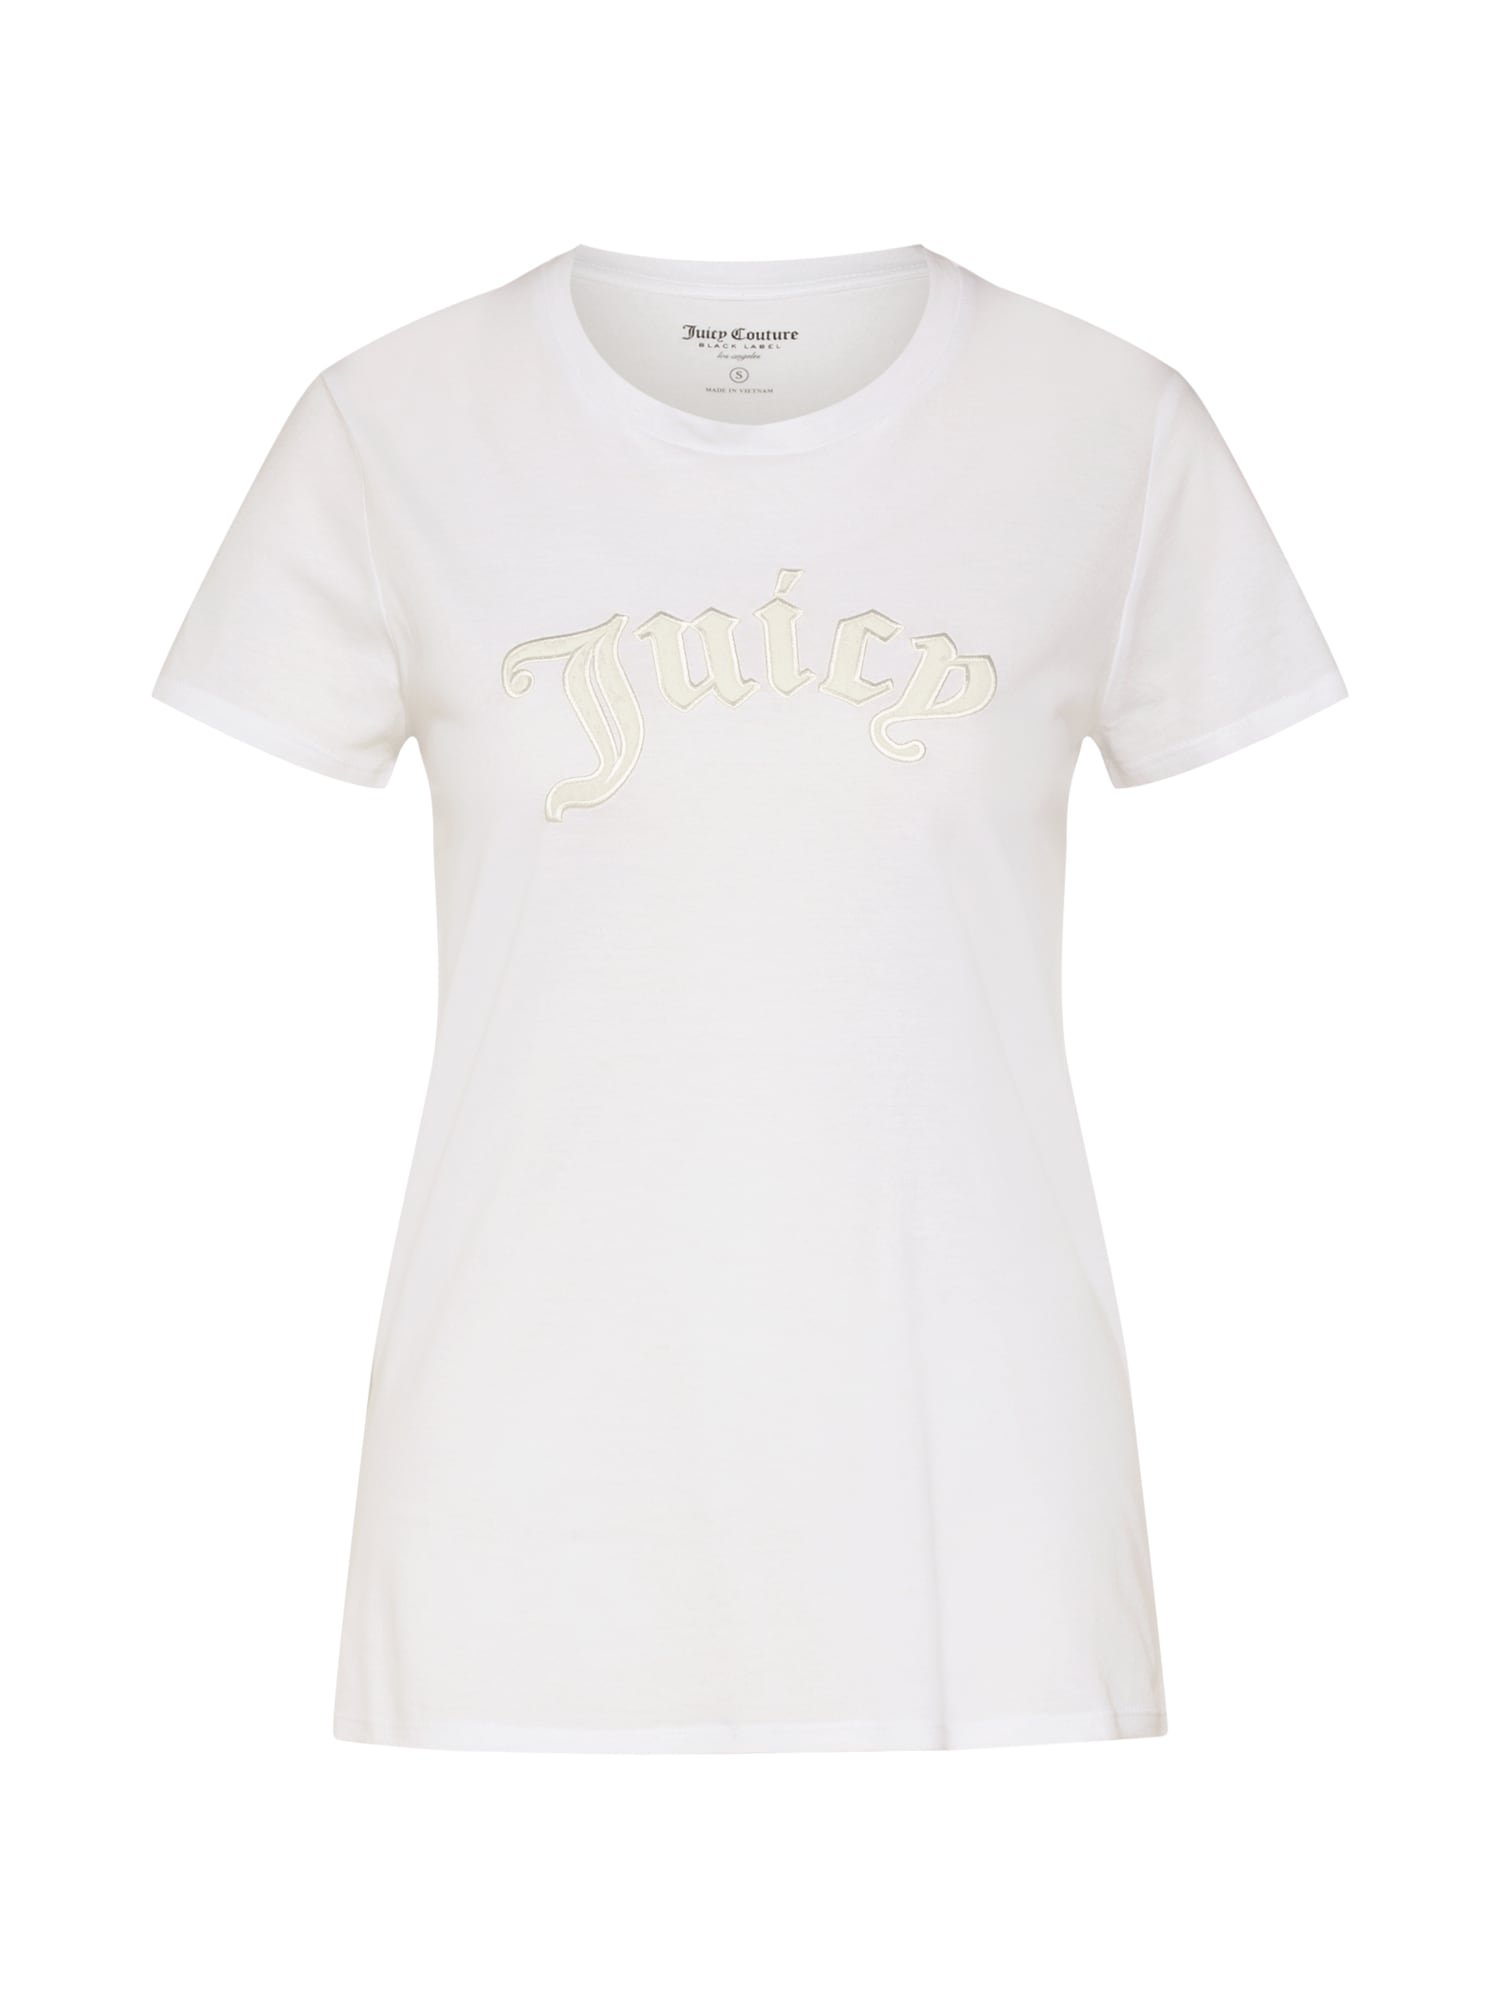 Tričko JUICY GOTHIC TEE bílá Juicy Couture Black Label